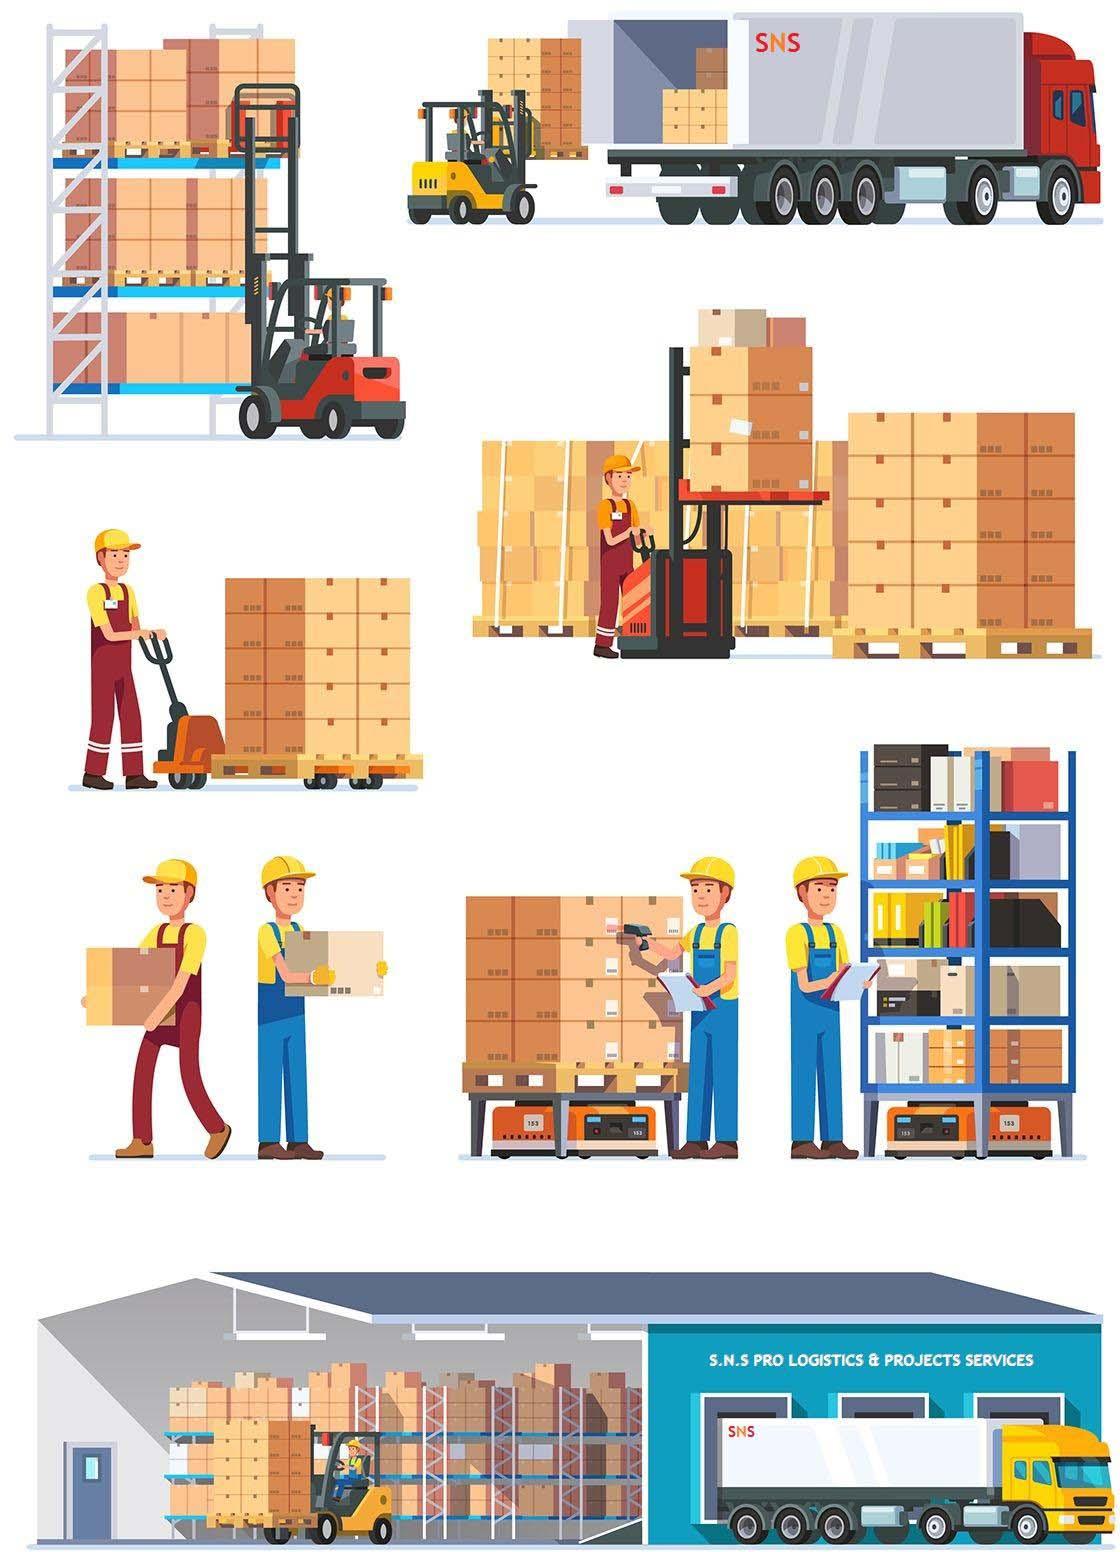 Pro Logistics & Projects Services